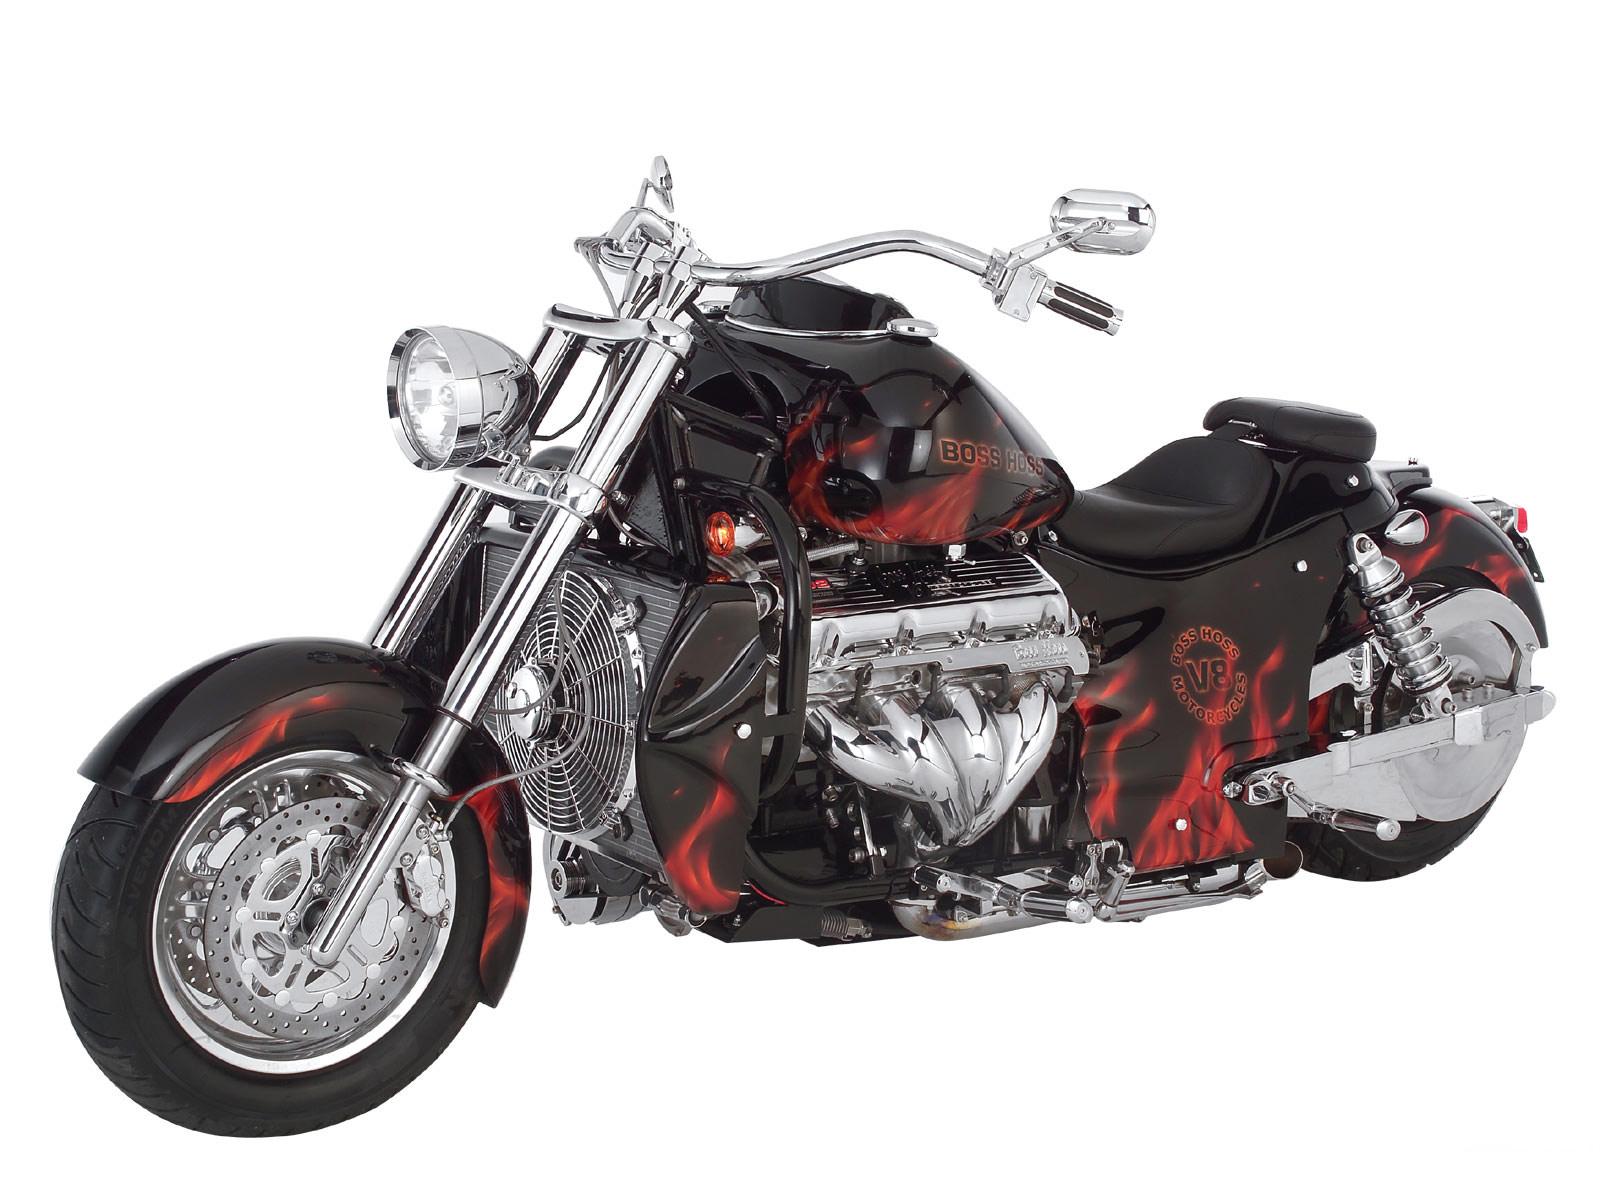 Harley Dealers In Florida >> 2002 BOSS HOSS BHC-3 502 motorcycle desktop wallpaper